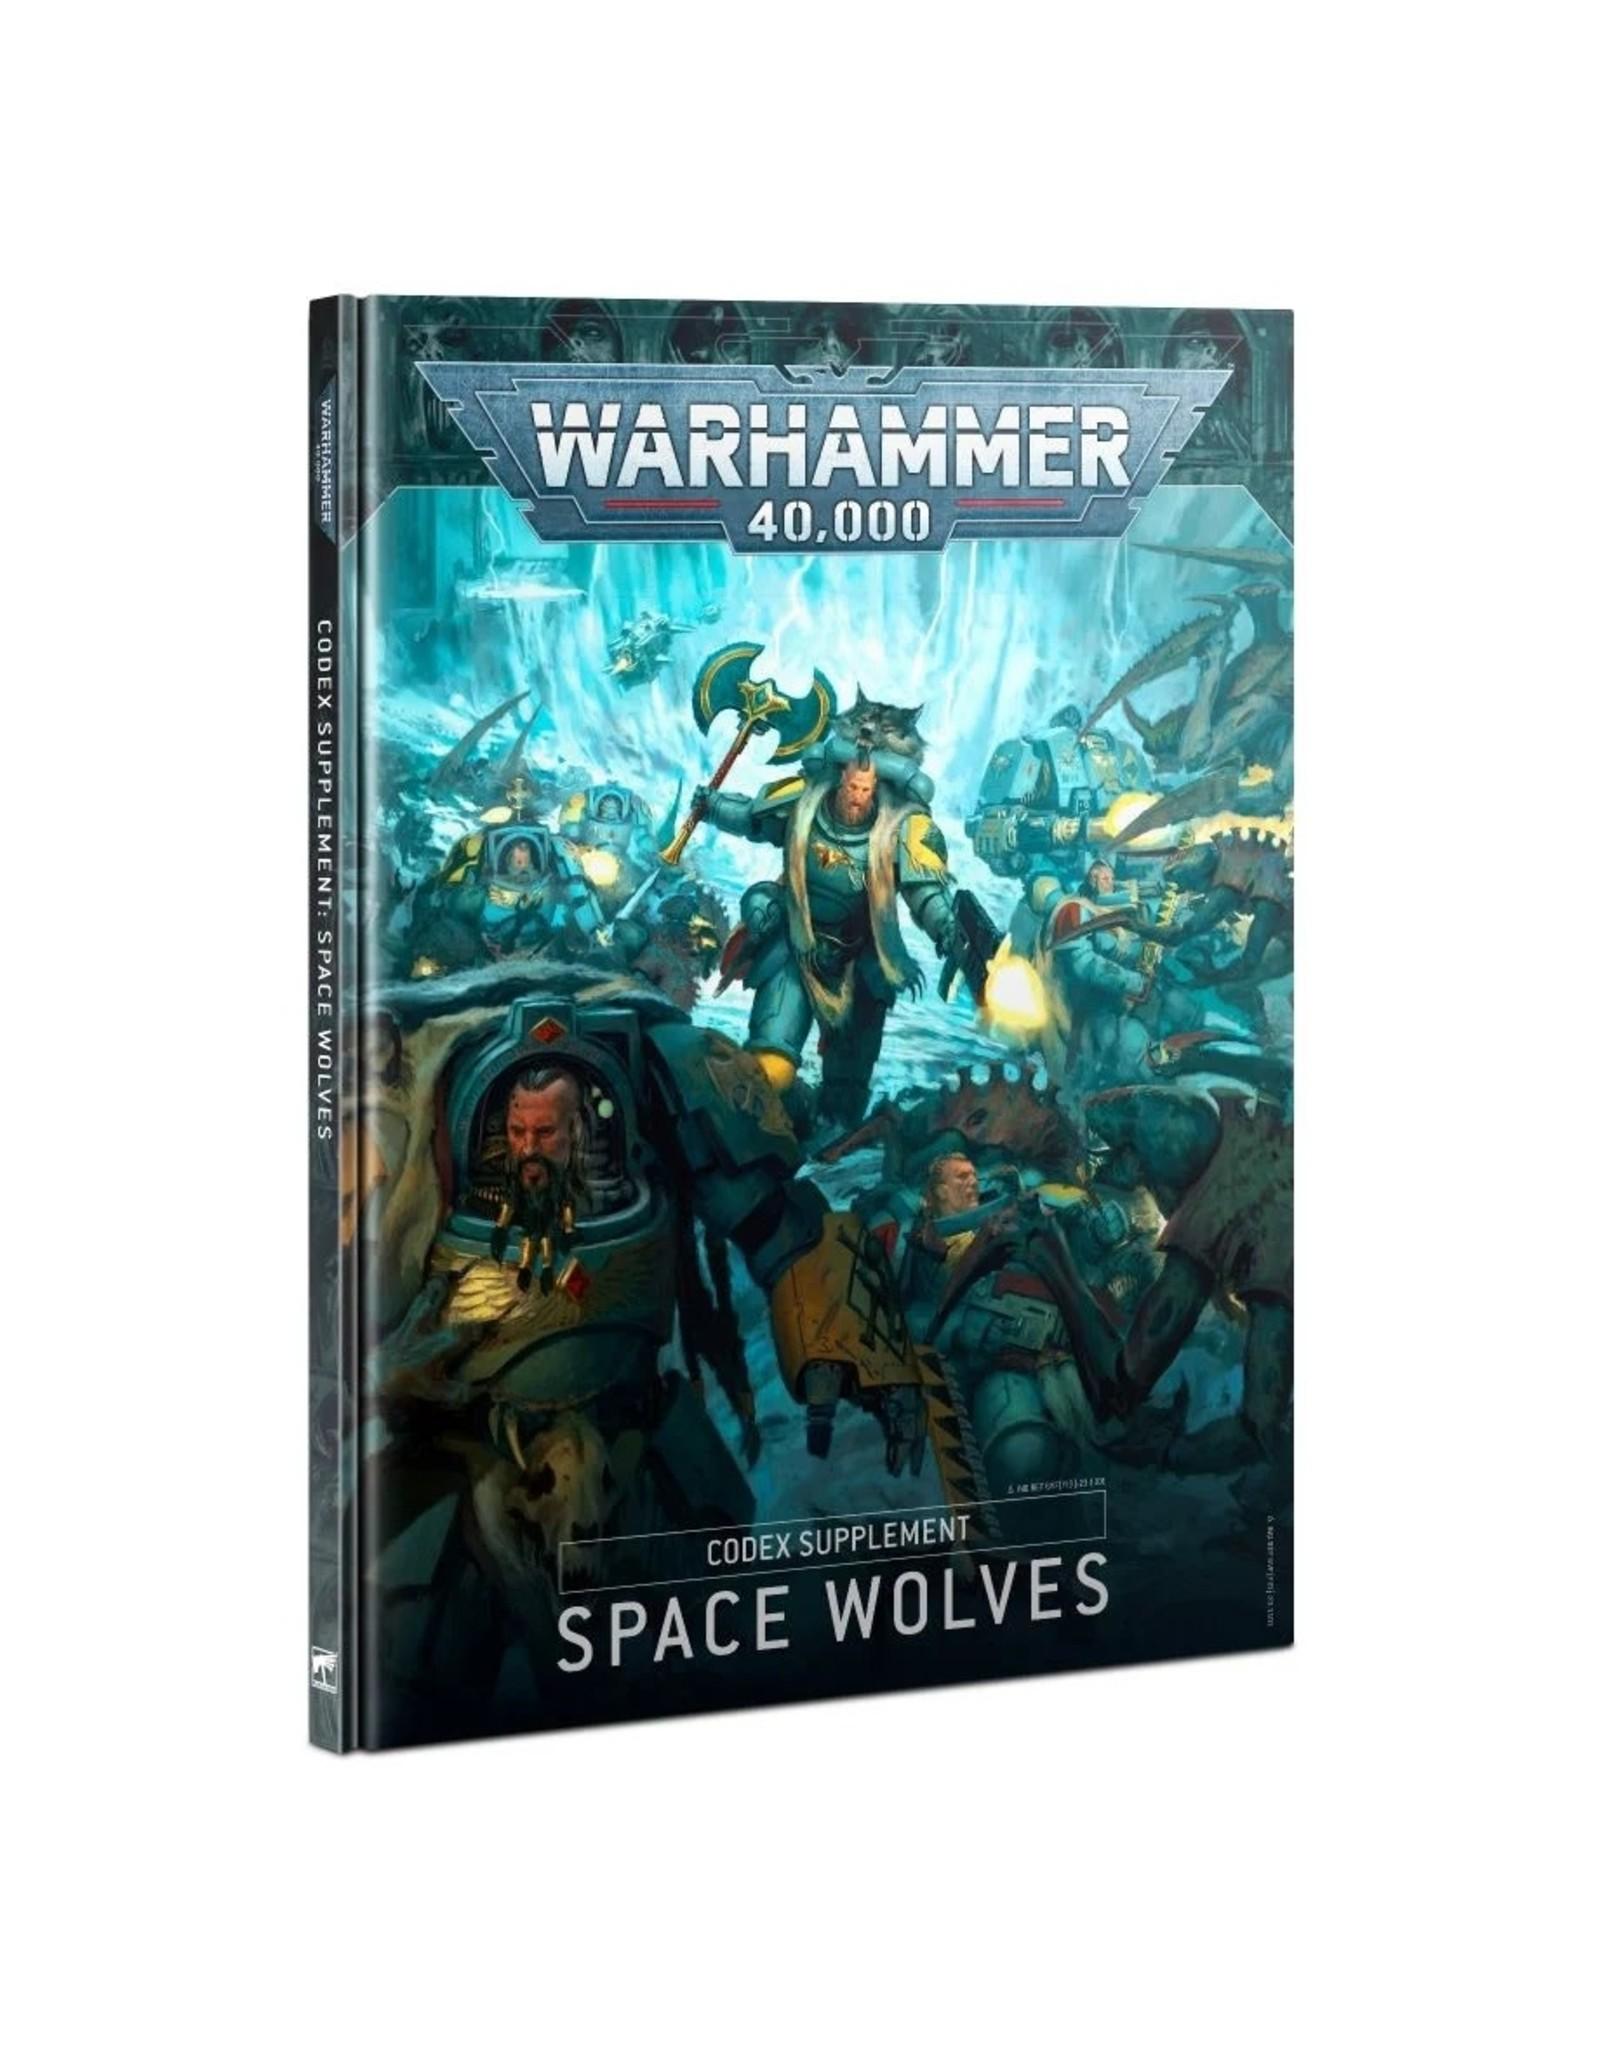 Games Workshop WH40K Codex Supplement: Space Wolves